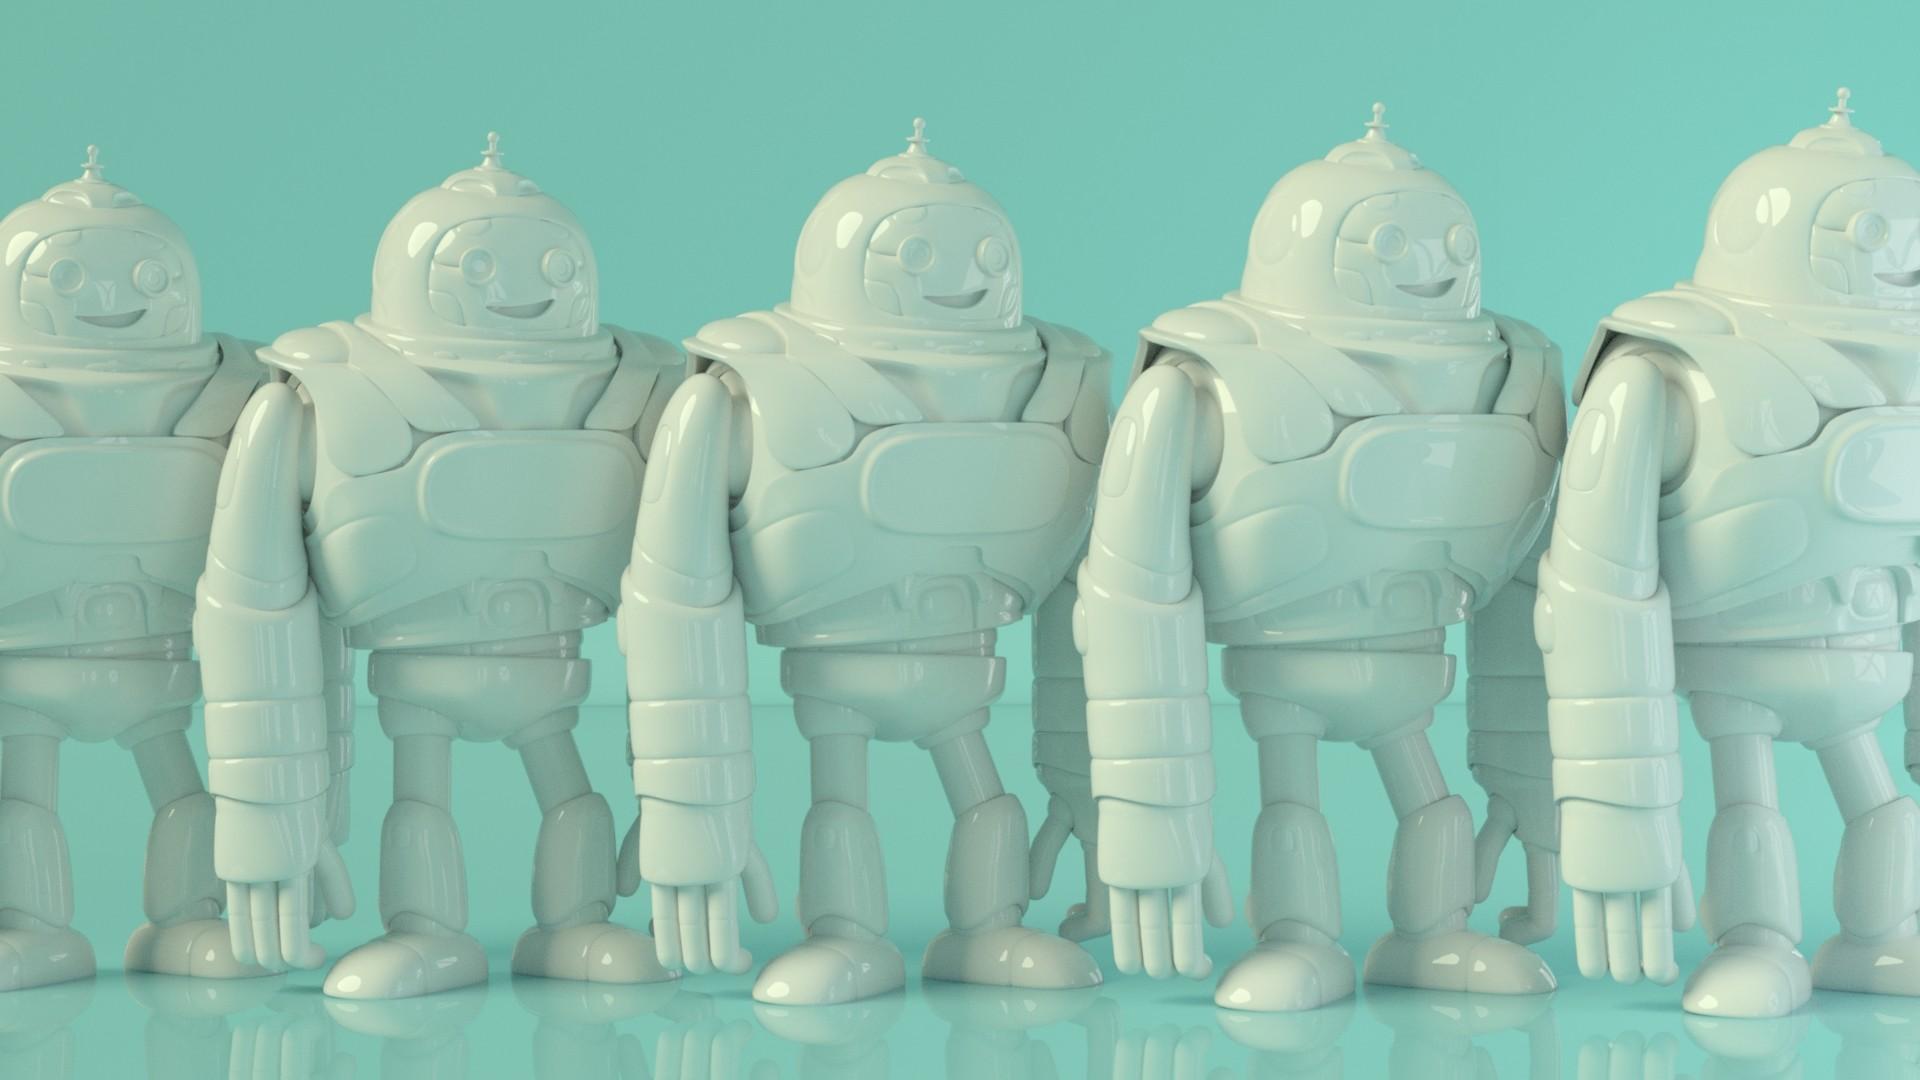 Michael wu 28 robot1